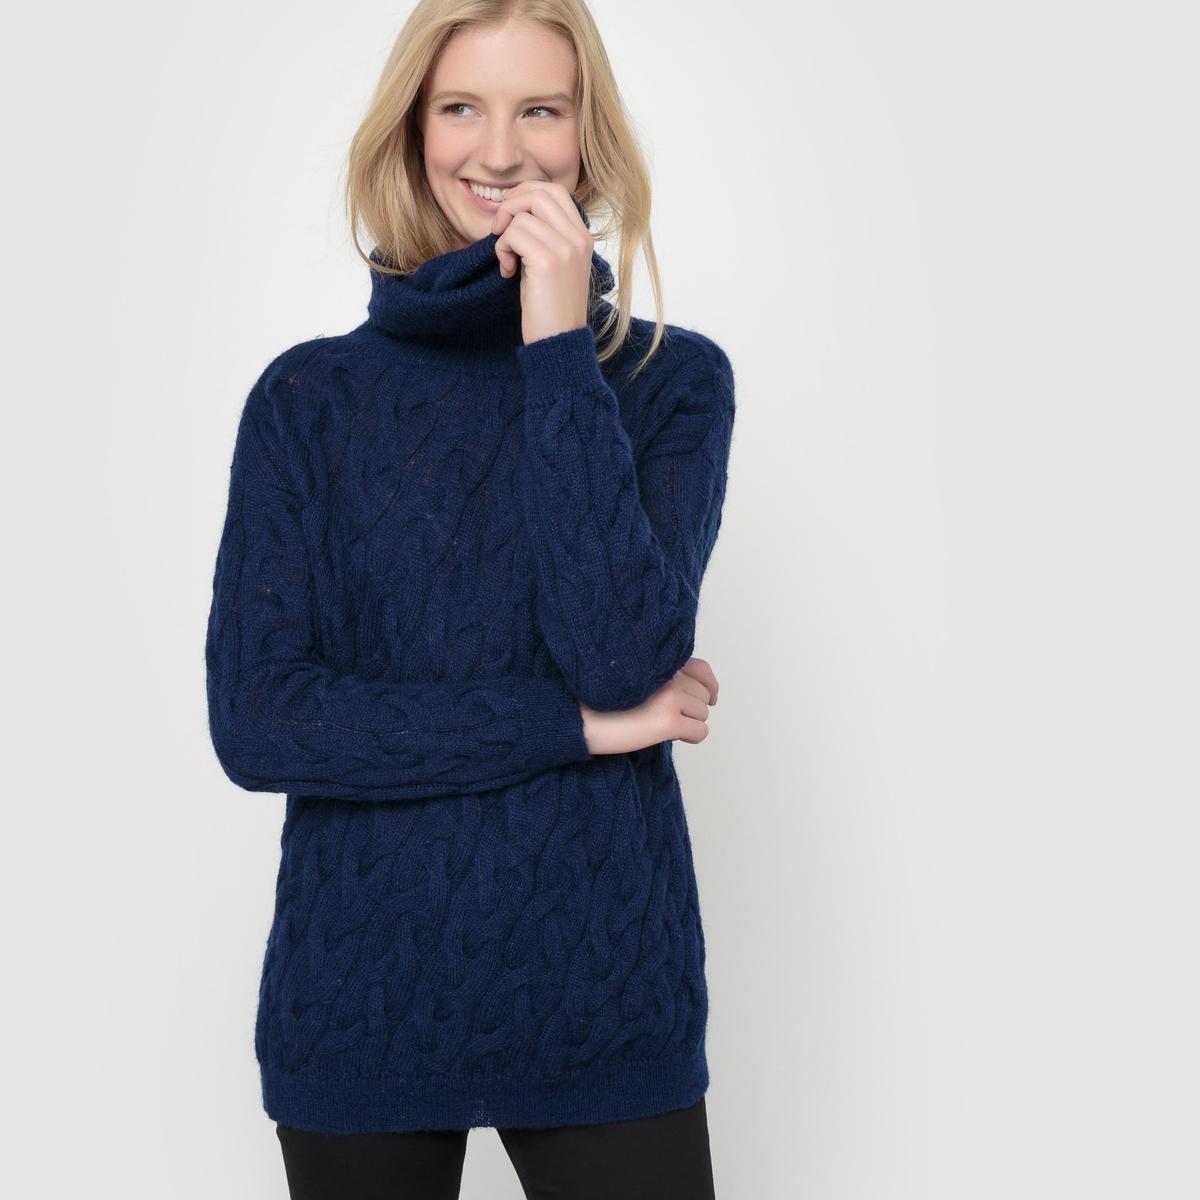 Пуловер-водолазка, трикотаж с узором косы, шерсть/мохер La Redoute Collections